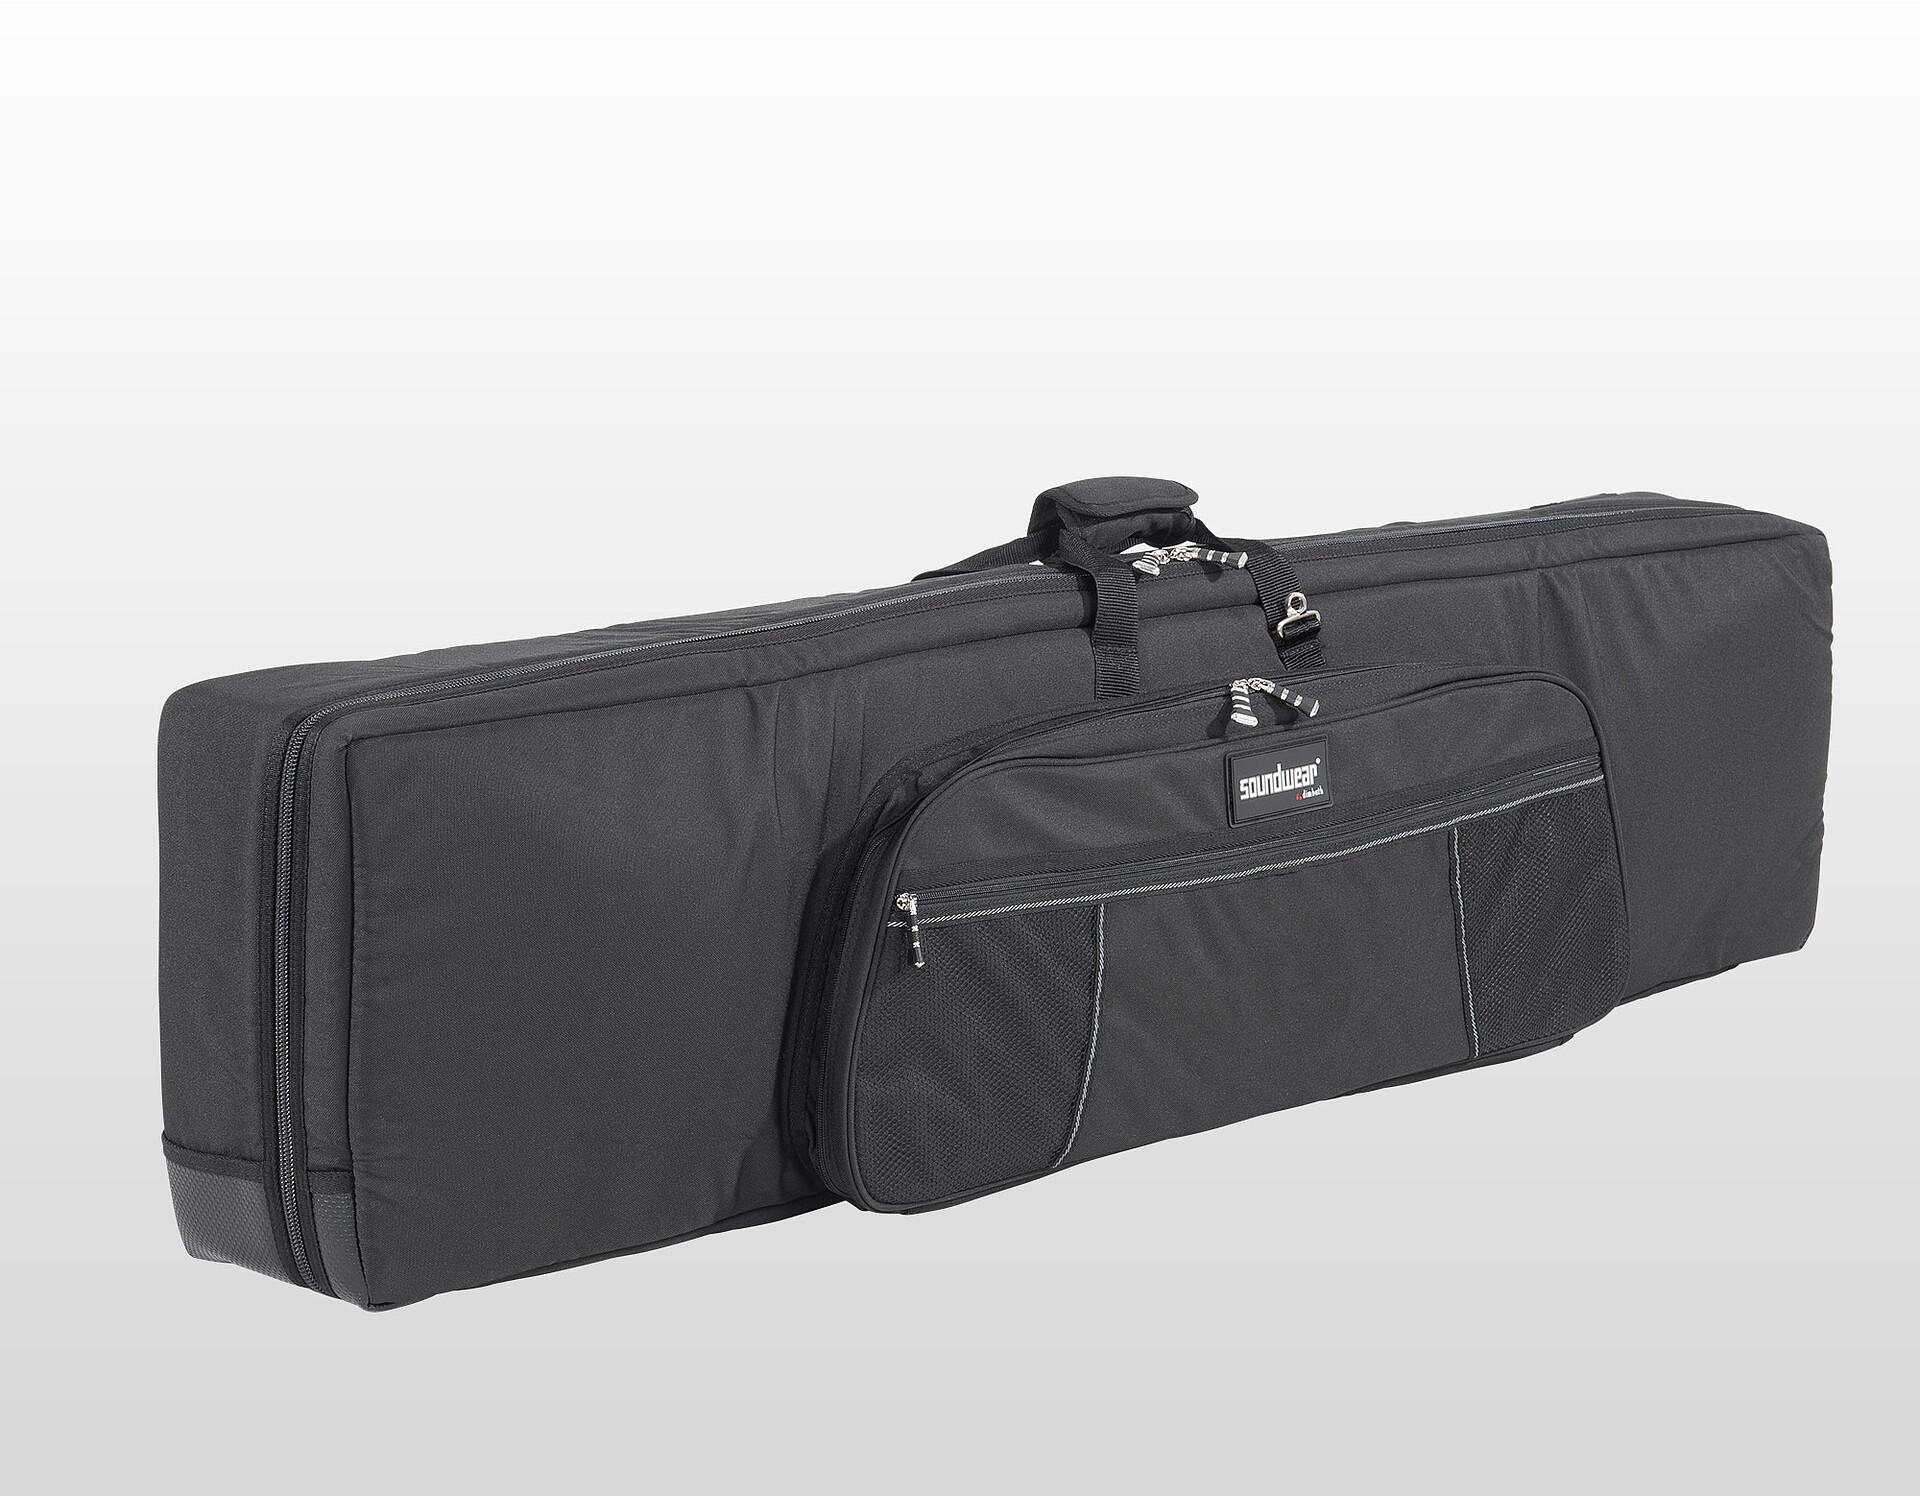 Soundwear Protect-Bag 83x24x10